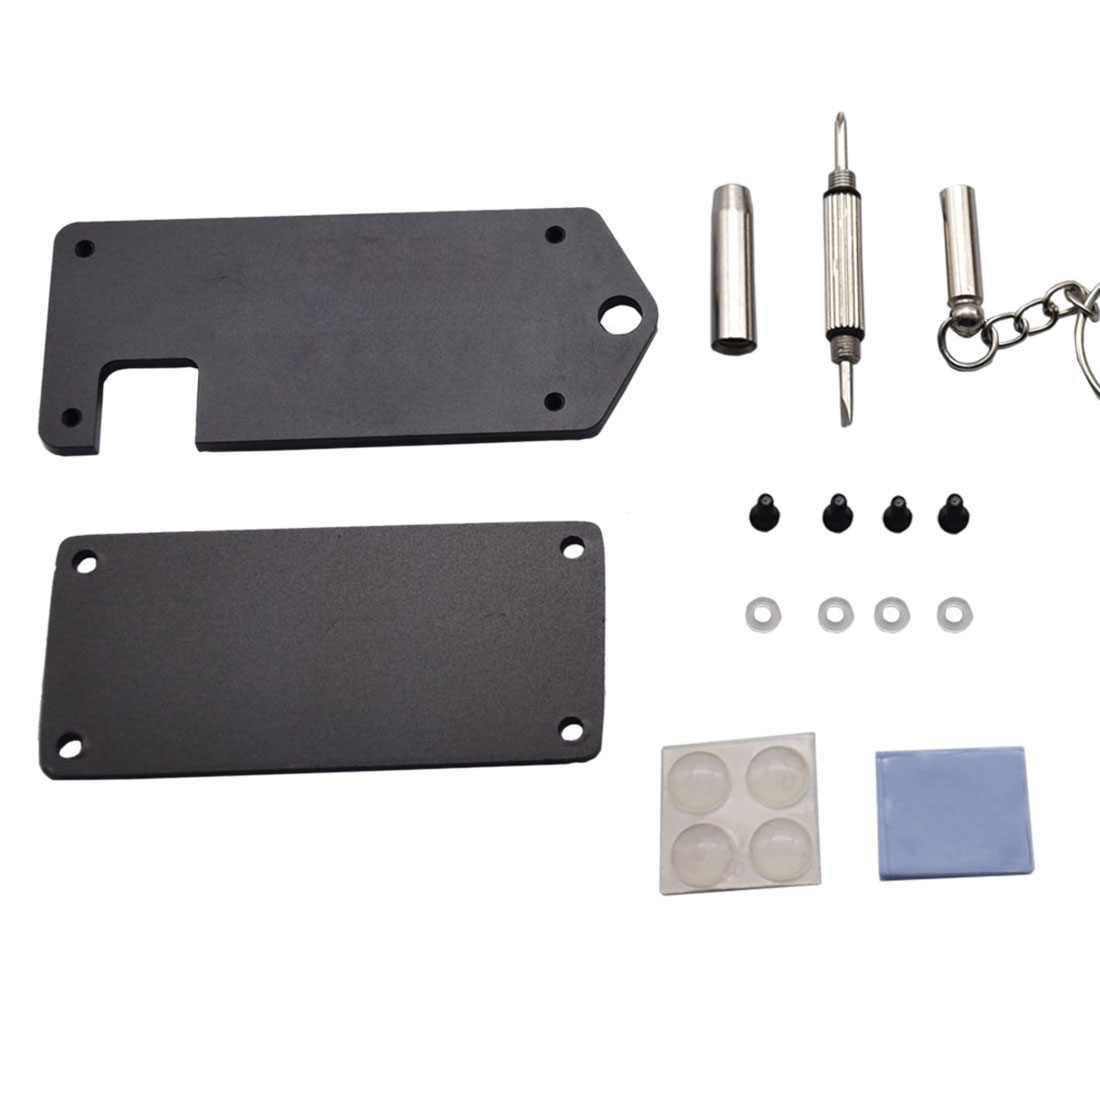 Modiker 1Pc Ultra-thin ZV2 CNC Aluminum Alloy Protective Case With Screwdriver For Raspberry Pi Zero / W - Black